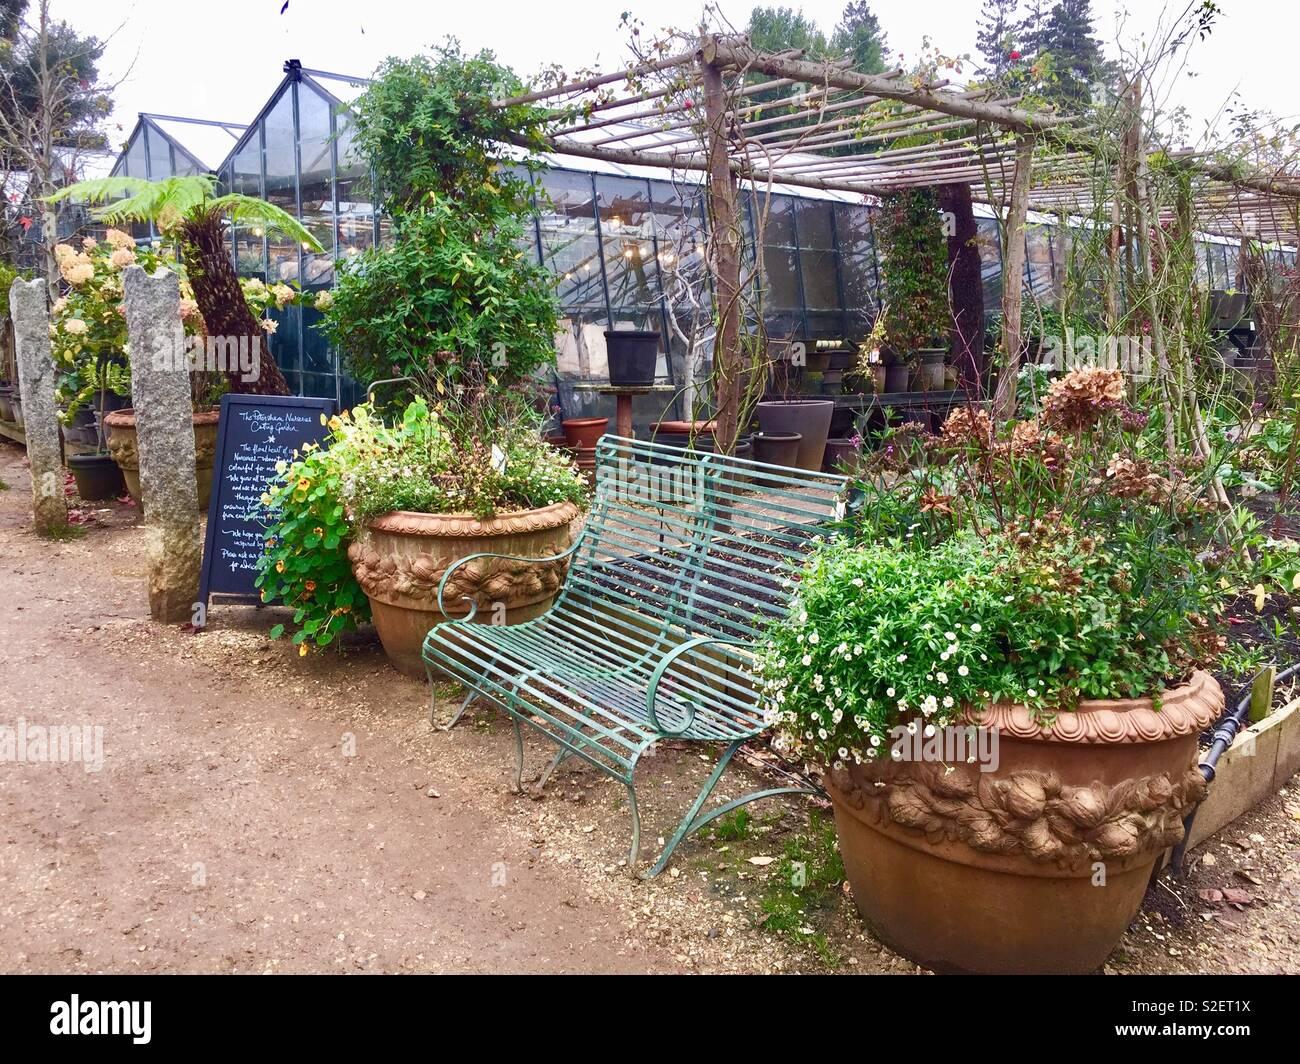 Garden seat, terracotta pots and greenhouses, Petersham Nurseries Stock Photo